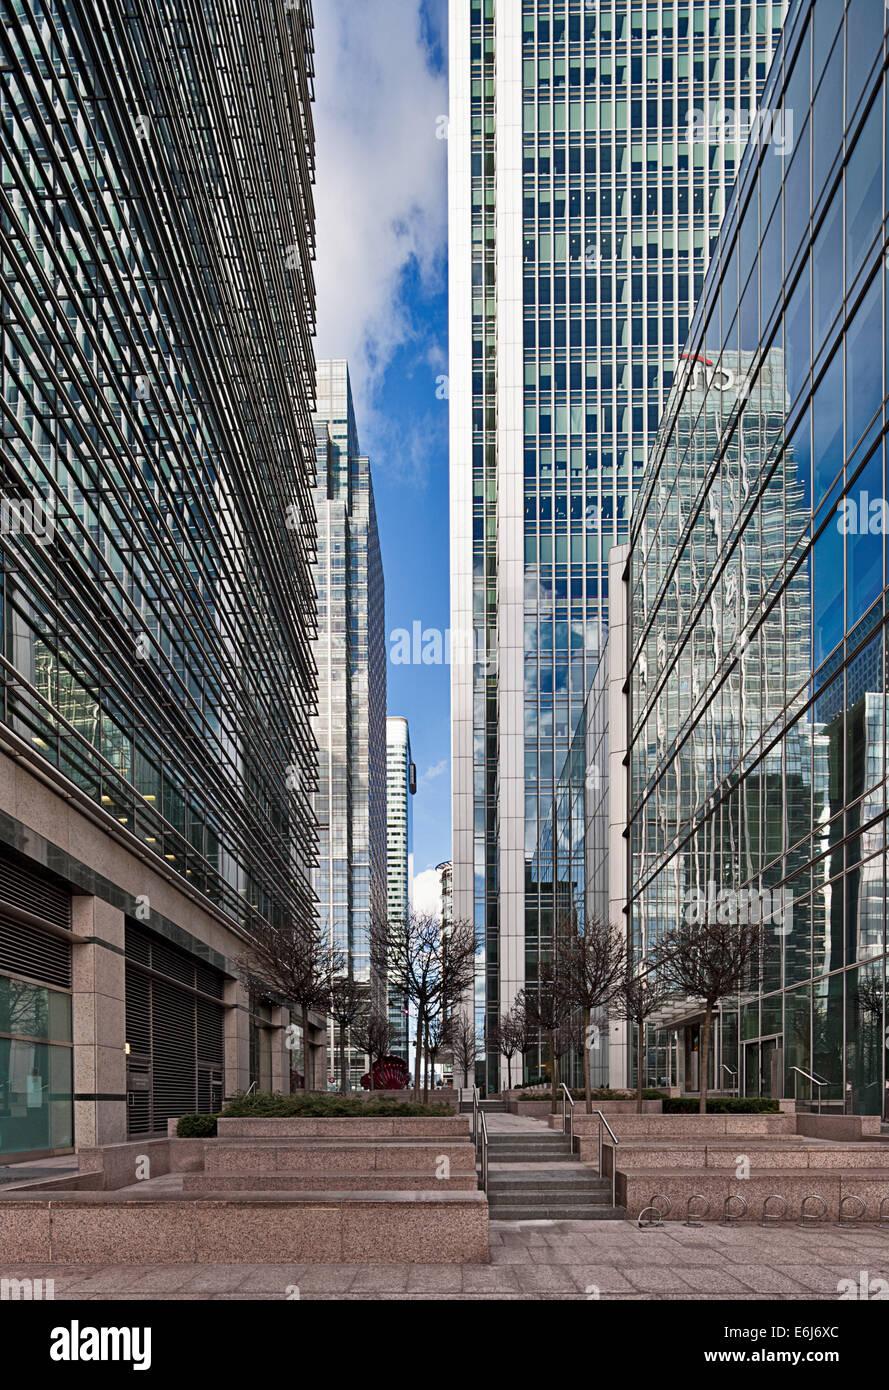 Straßenbild in Canary Wharf, Docklands. Stockbild